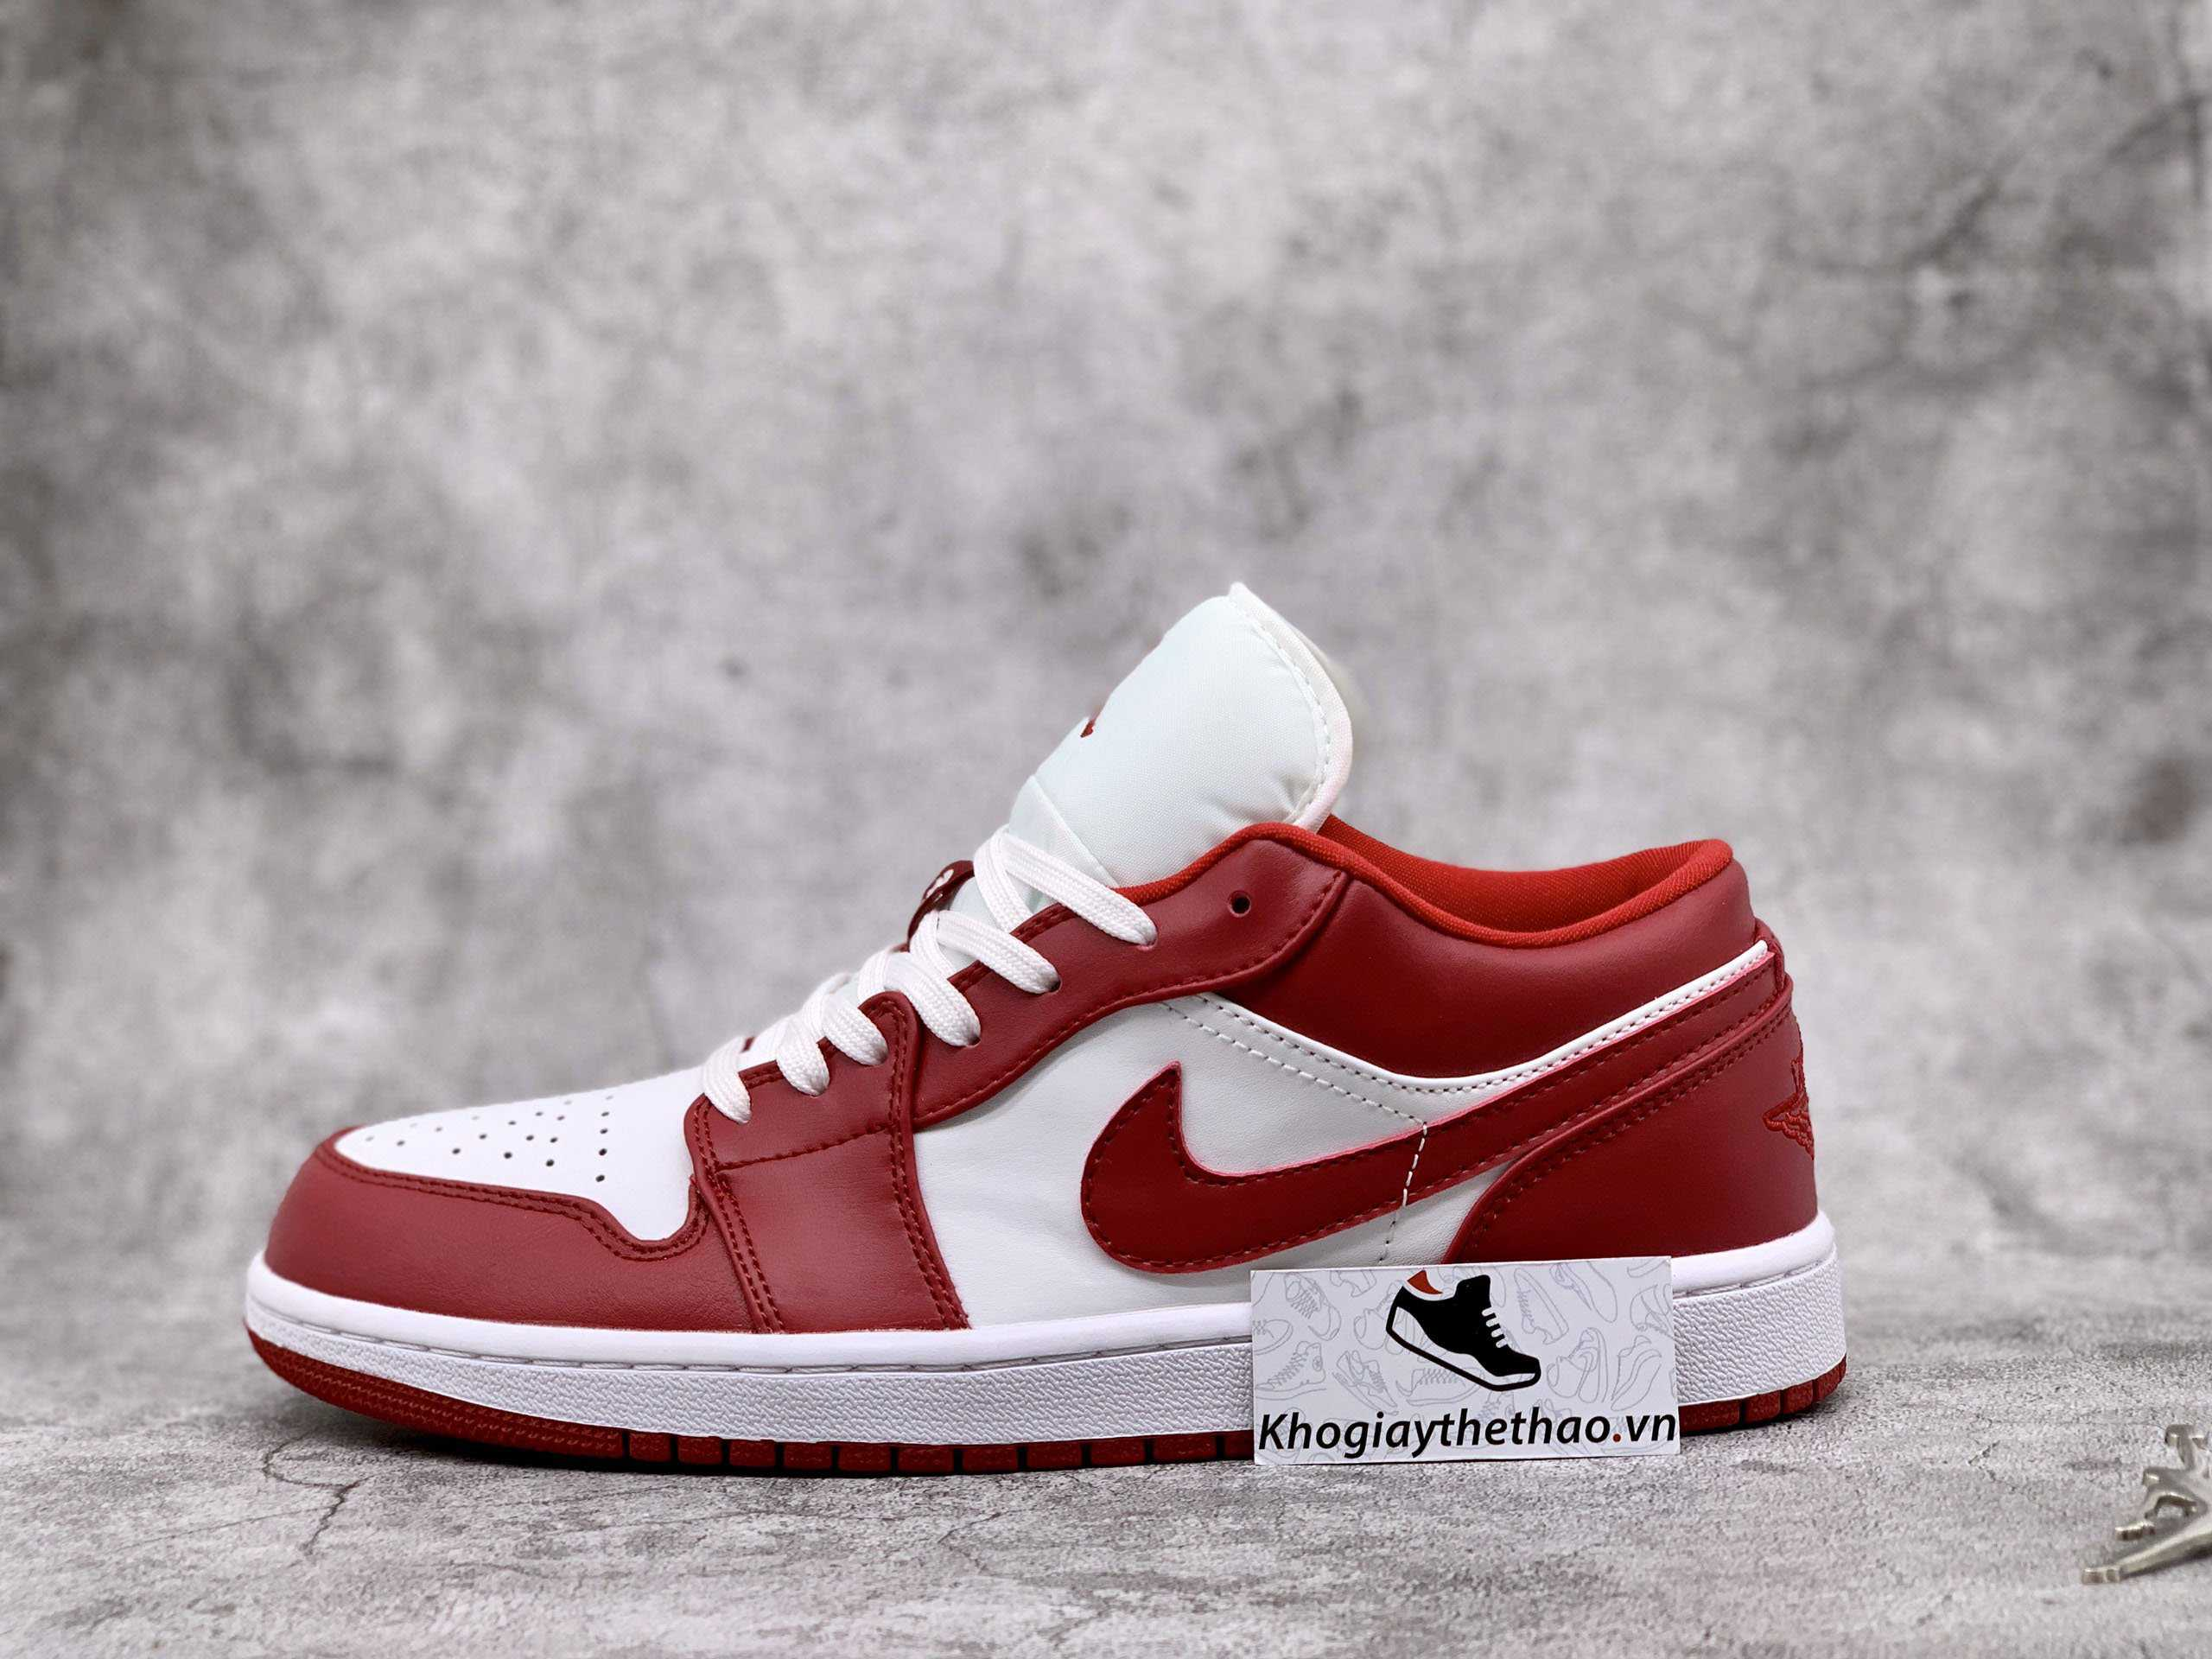 giày jordan low gym red thấp cổ